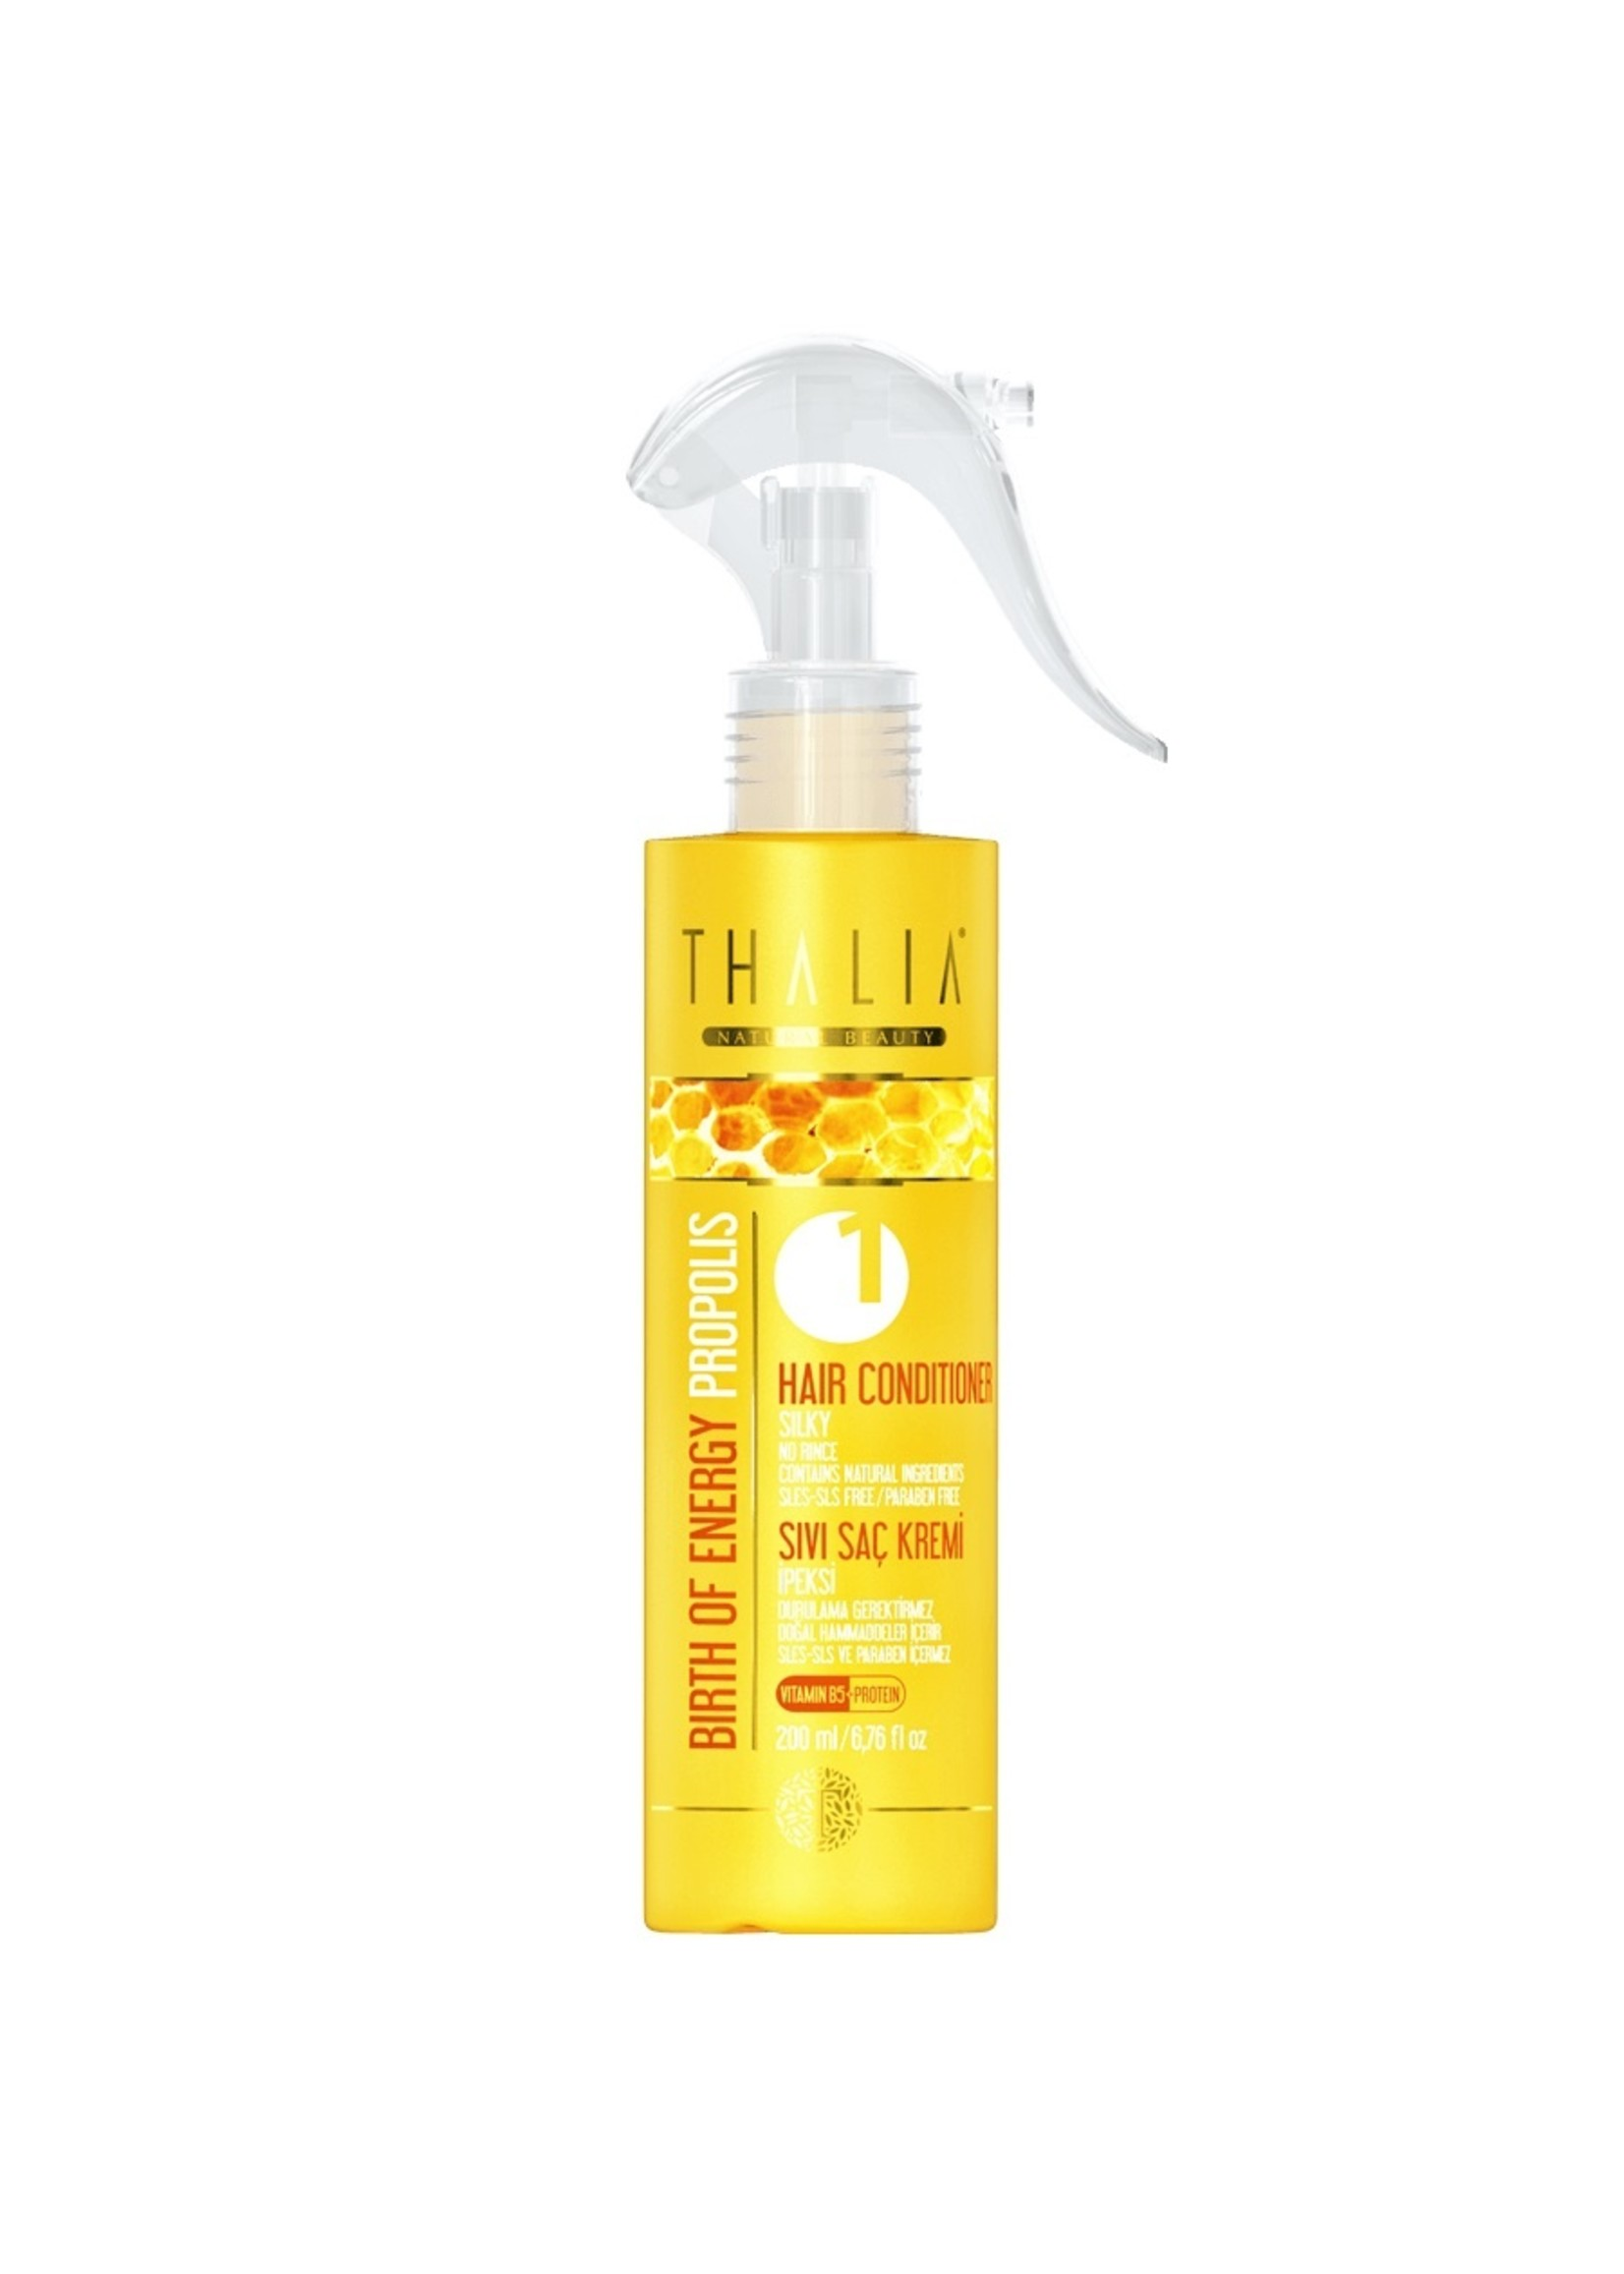 Thalia Propolis Leave-in Conditioner 200 ml